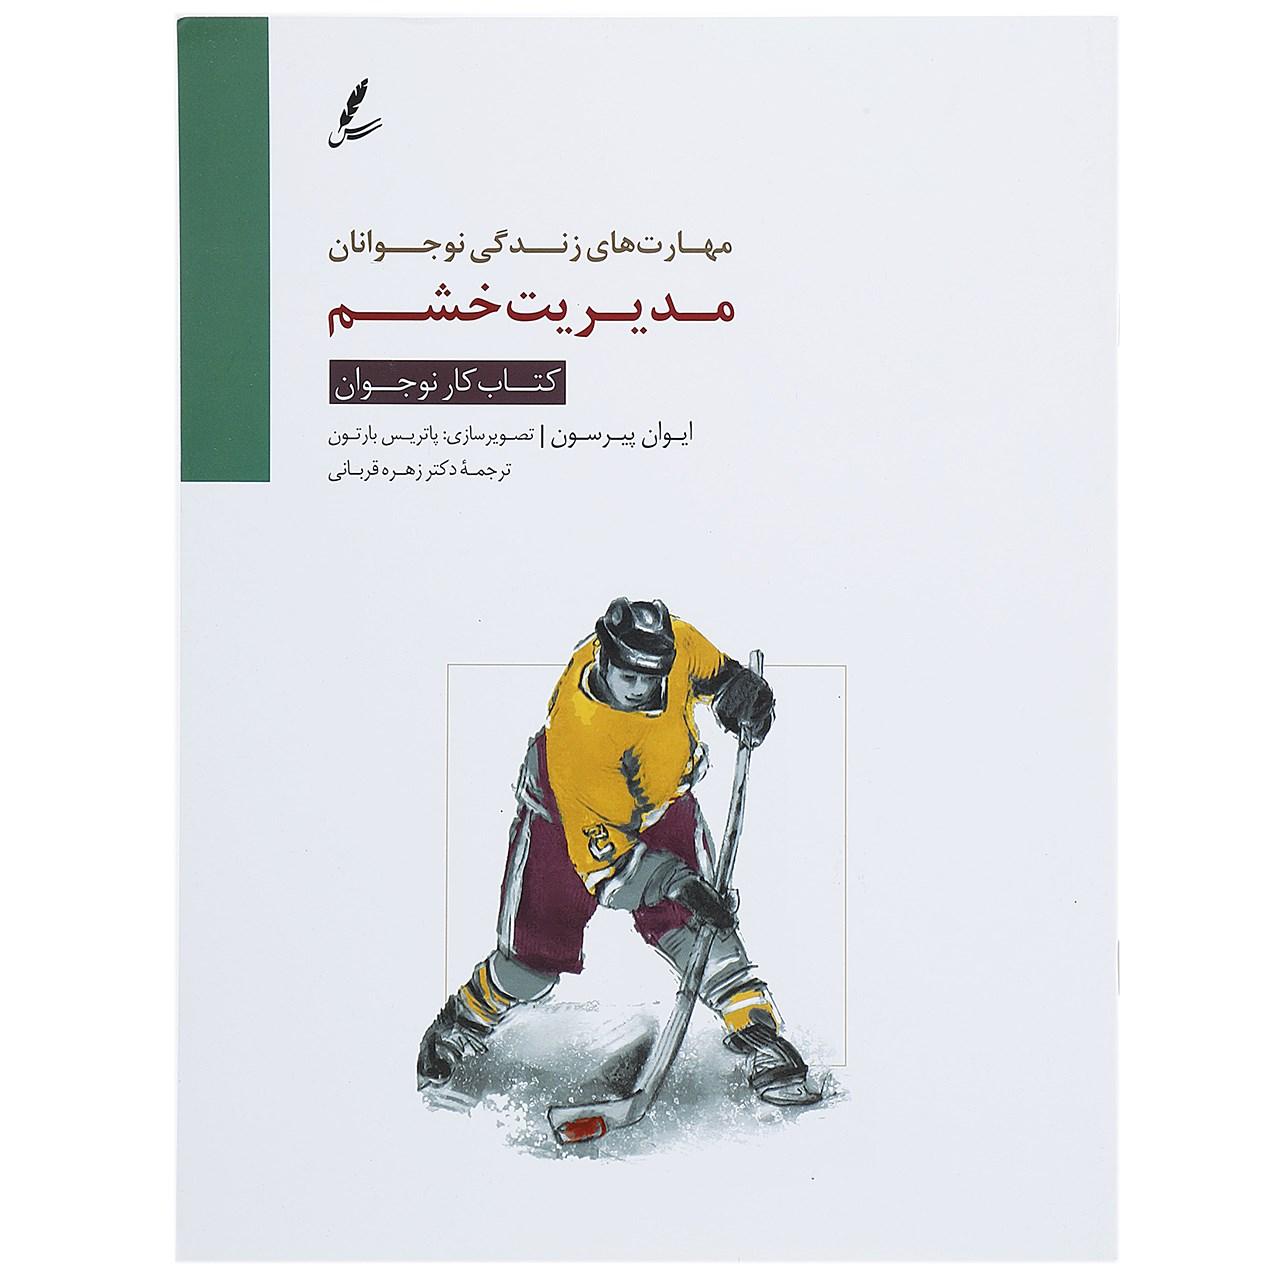 خرید                      کتاب مدیریت خشم کتاب کار نوجوان اثر ایوان پیرسون